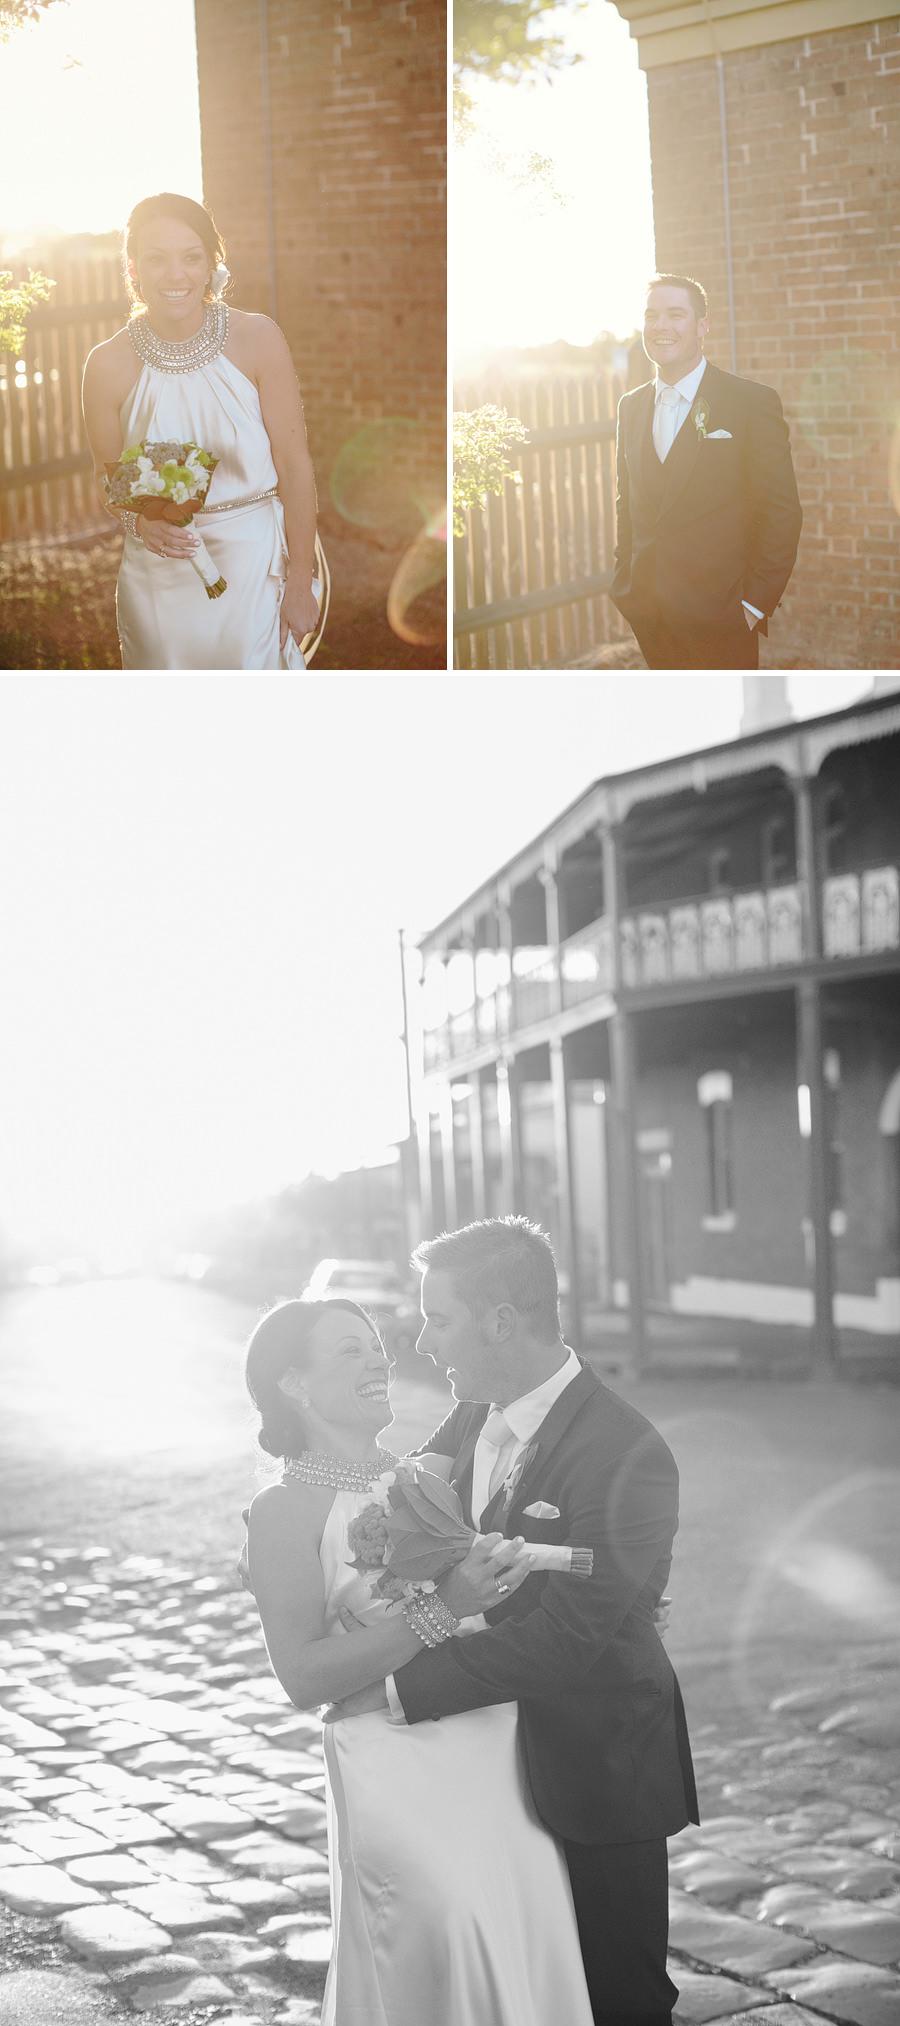 Millthorpe Wedding Photography: Bridal Party Portraits